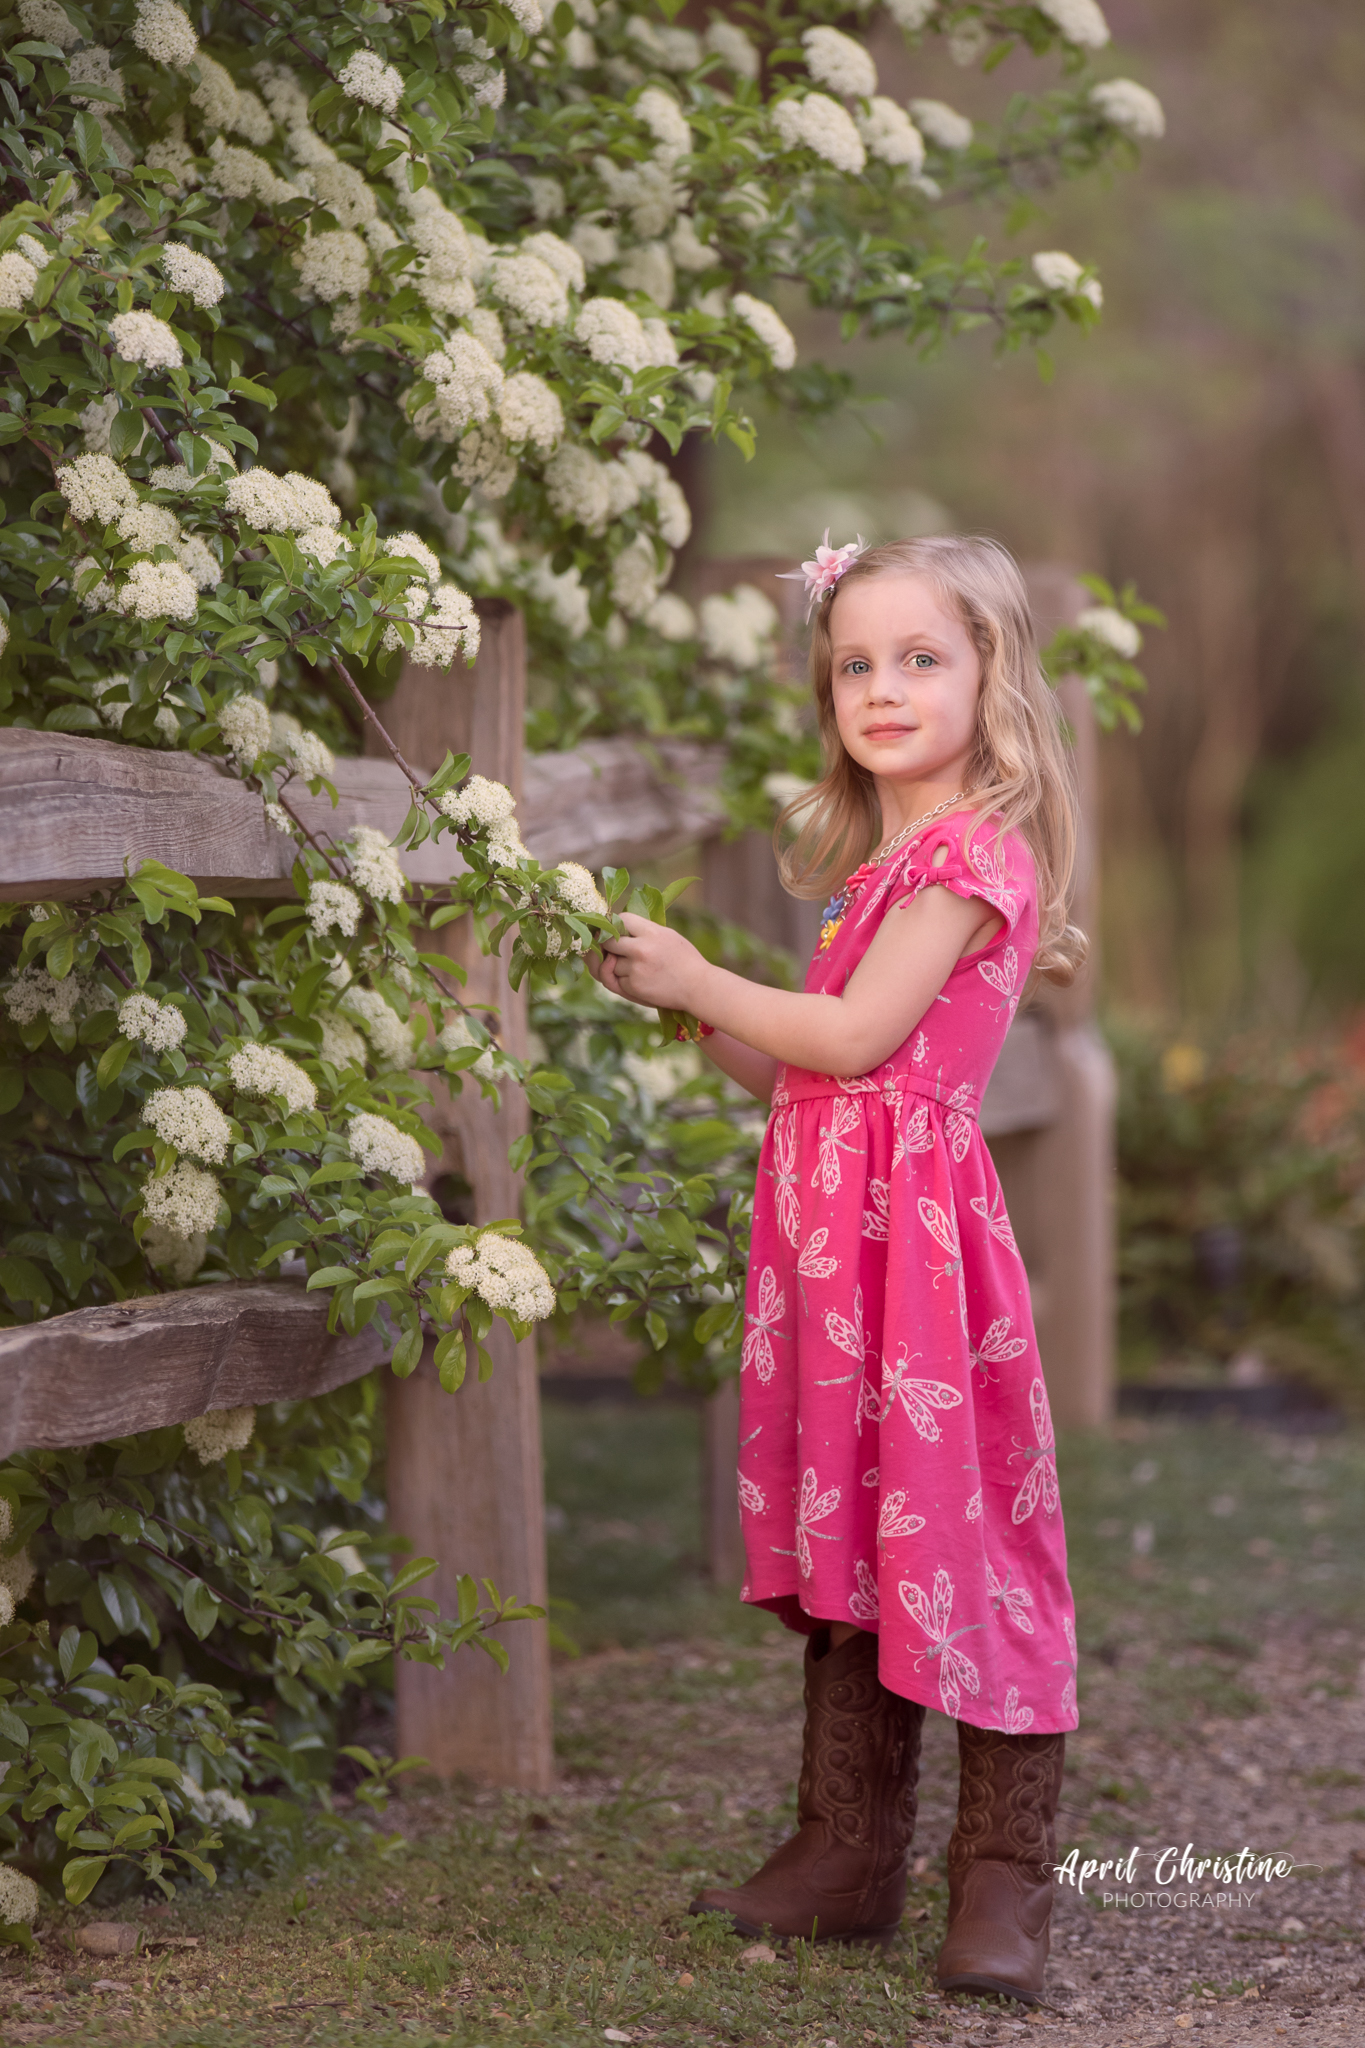 Childrens Photos at Fort Worth Botanical Gardens- Fort Worth Child Photographer